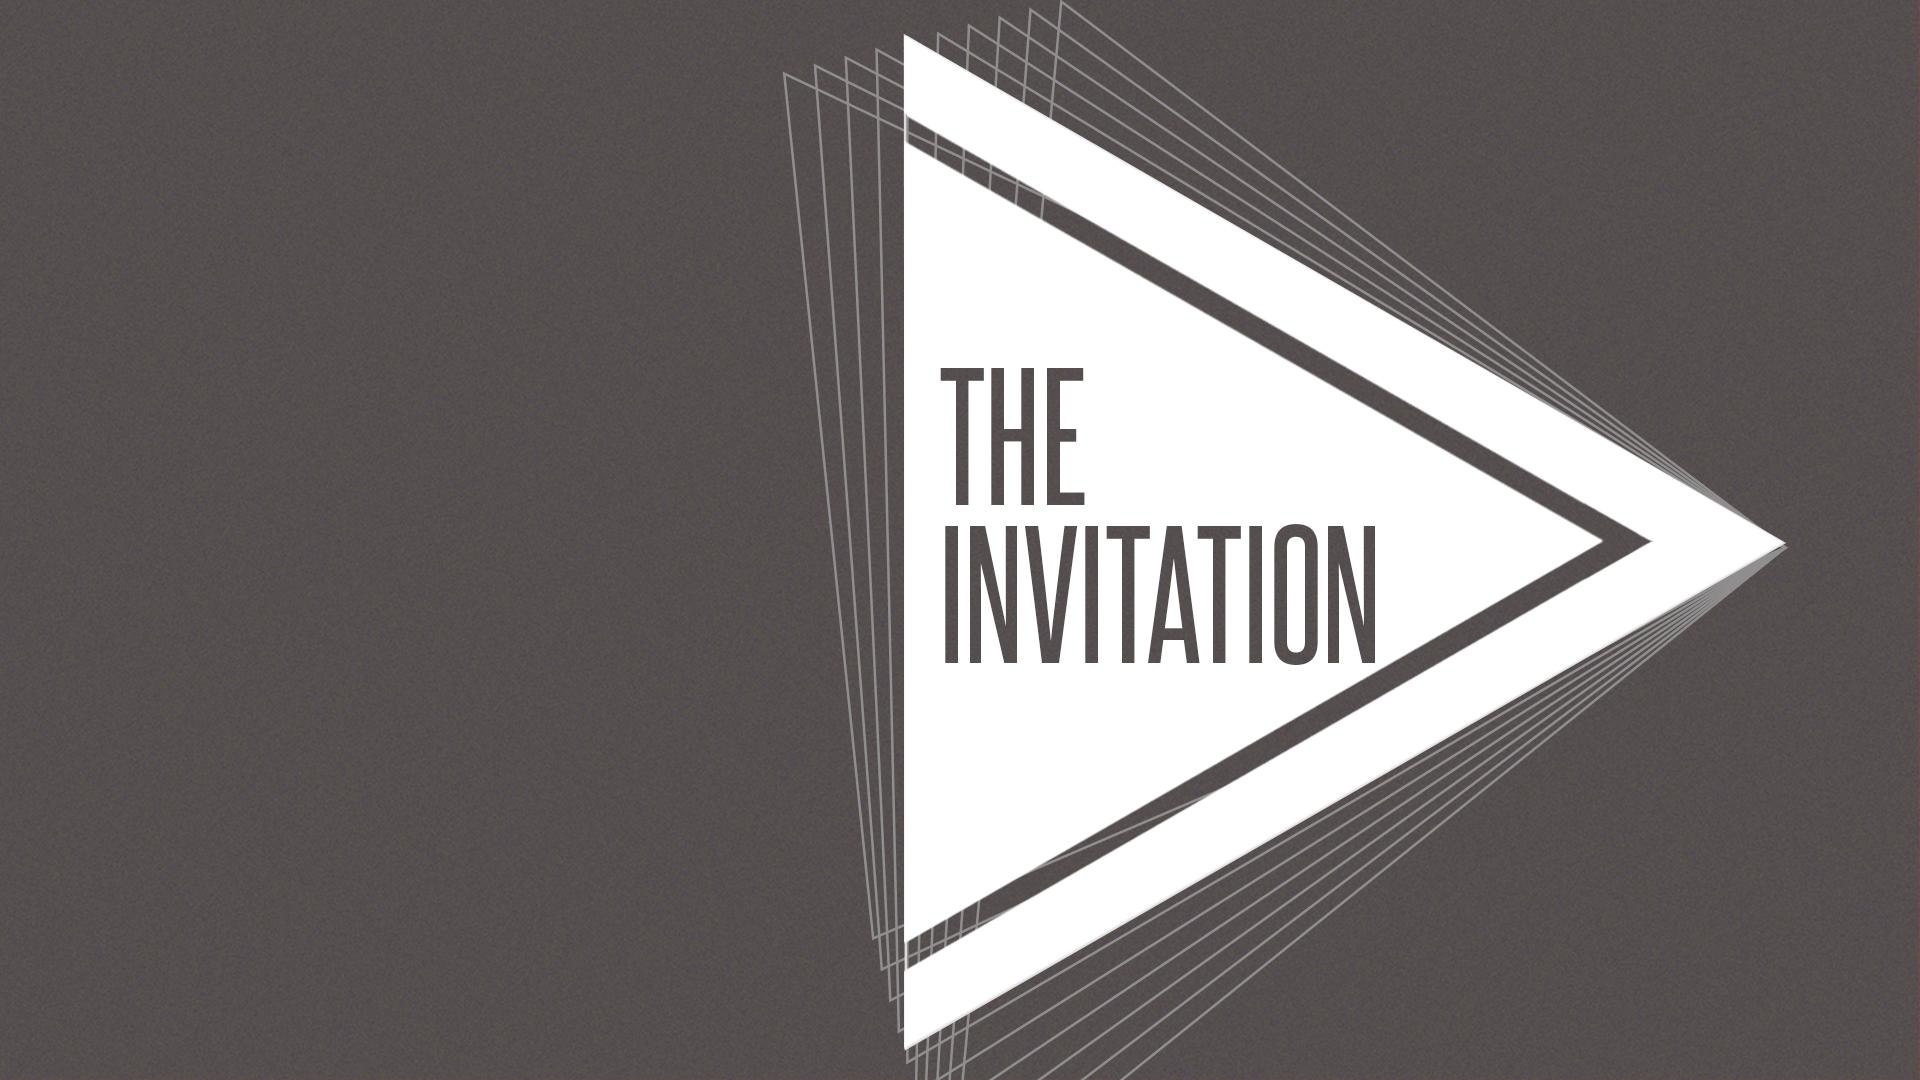 TheInvitation.jpg